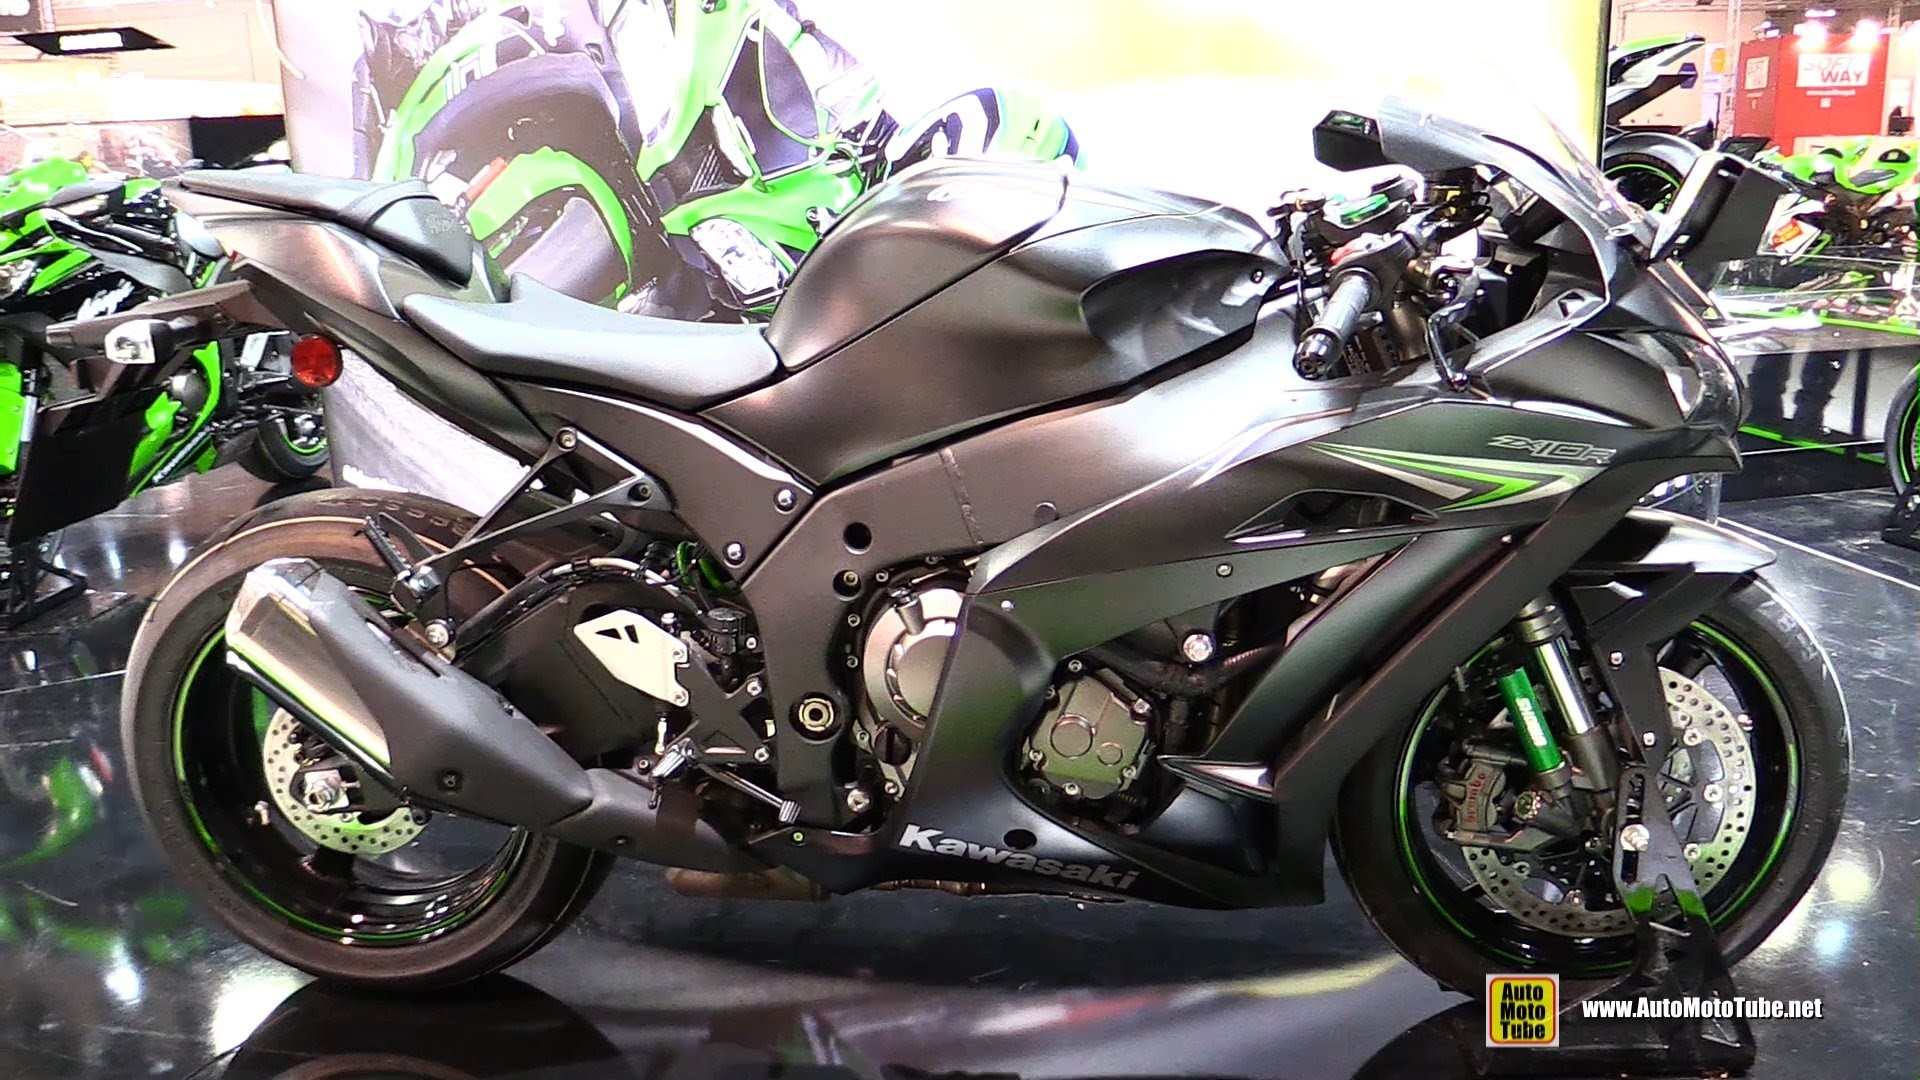 1920x1080 2017 Kawasaki ZX 10R A 2016 Ninja Zx10r Walkaround 2015 Eicma Milan